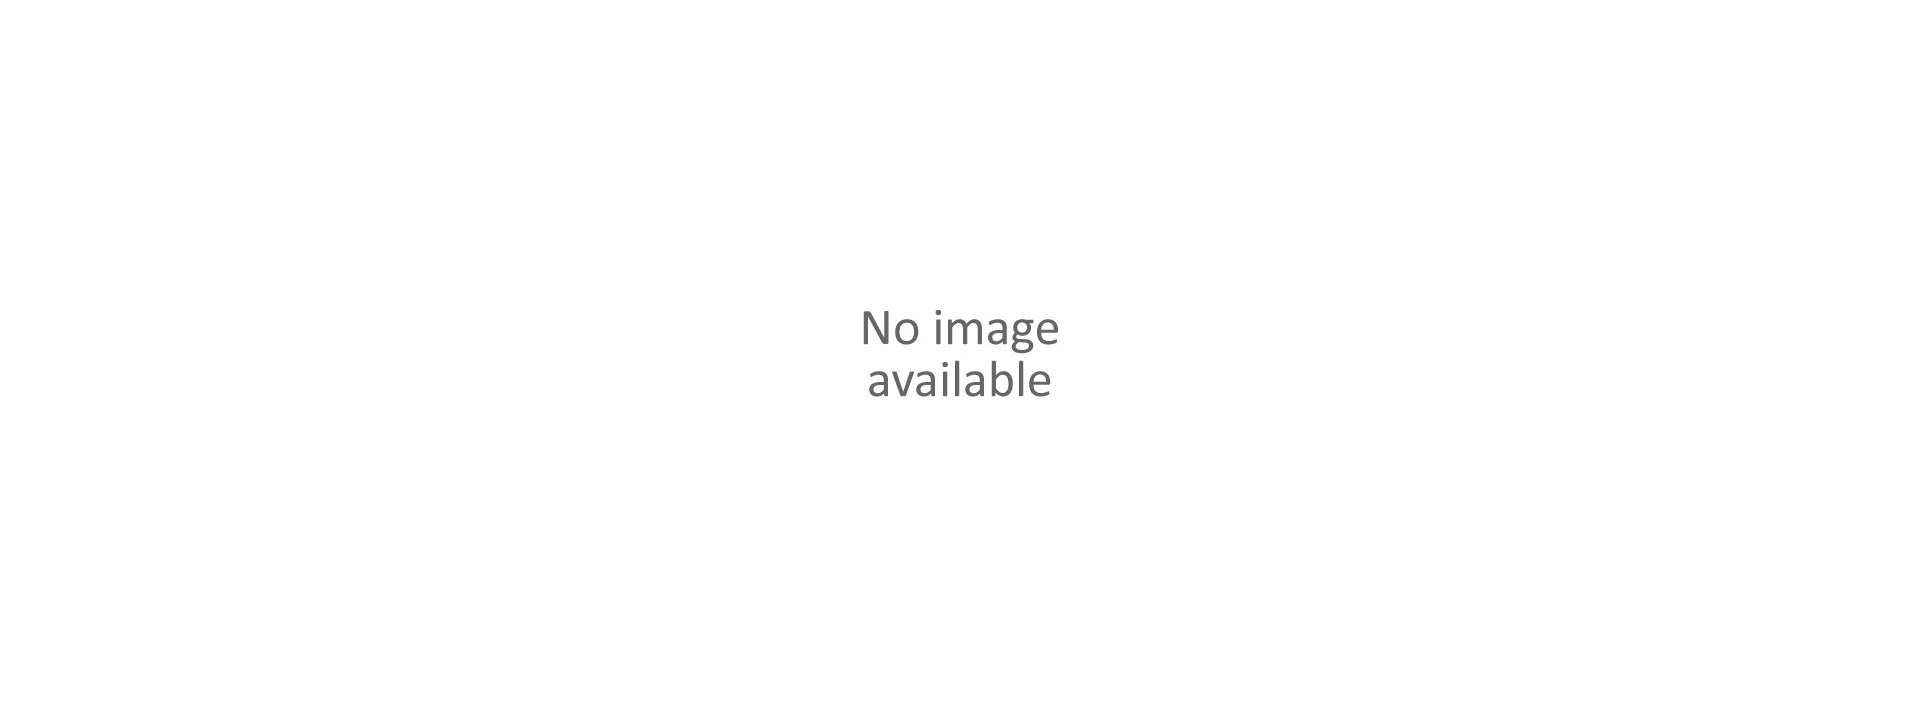 ADRENNALINNA CHAMPIONS 2015 CAJA COMPLETA NORDIC EDITION